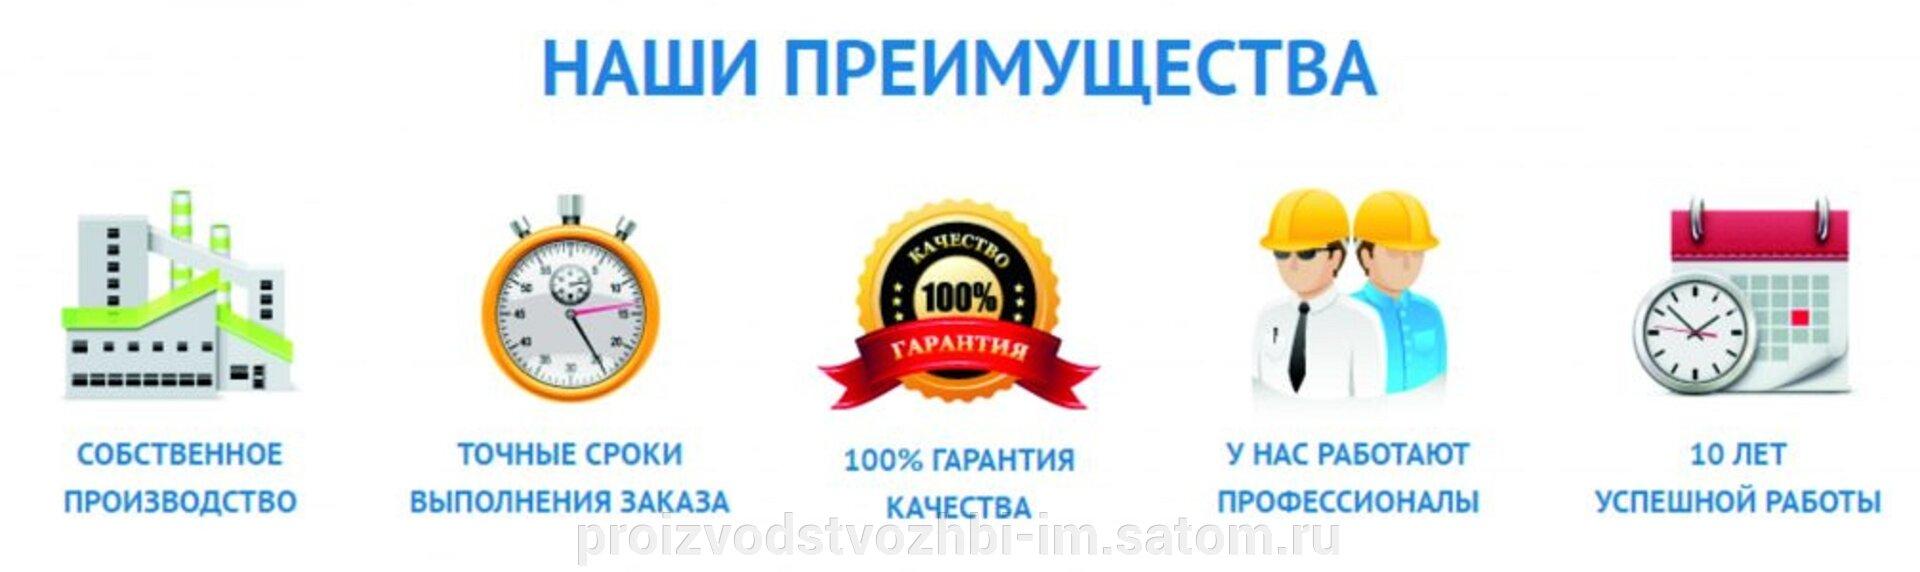 Лоток кабельный ЛК300.120.60-3 - фото pic_ca3ccaecdcfa139a1d379873625f01bd_1920x9000_1.jpg